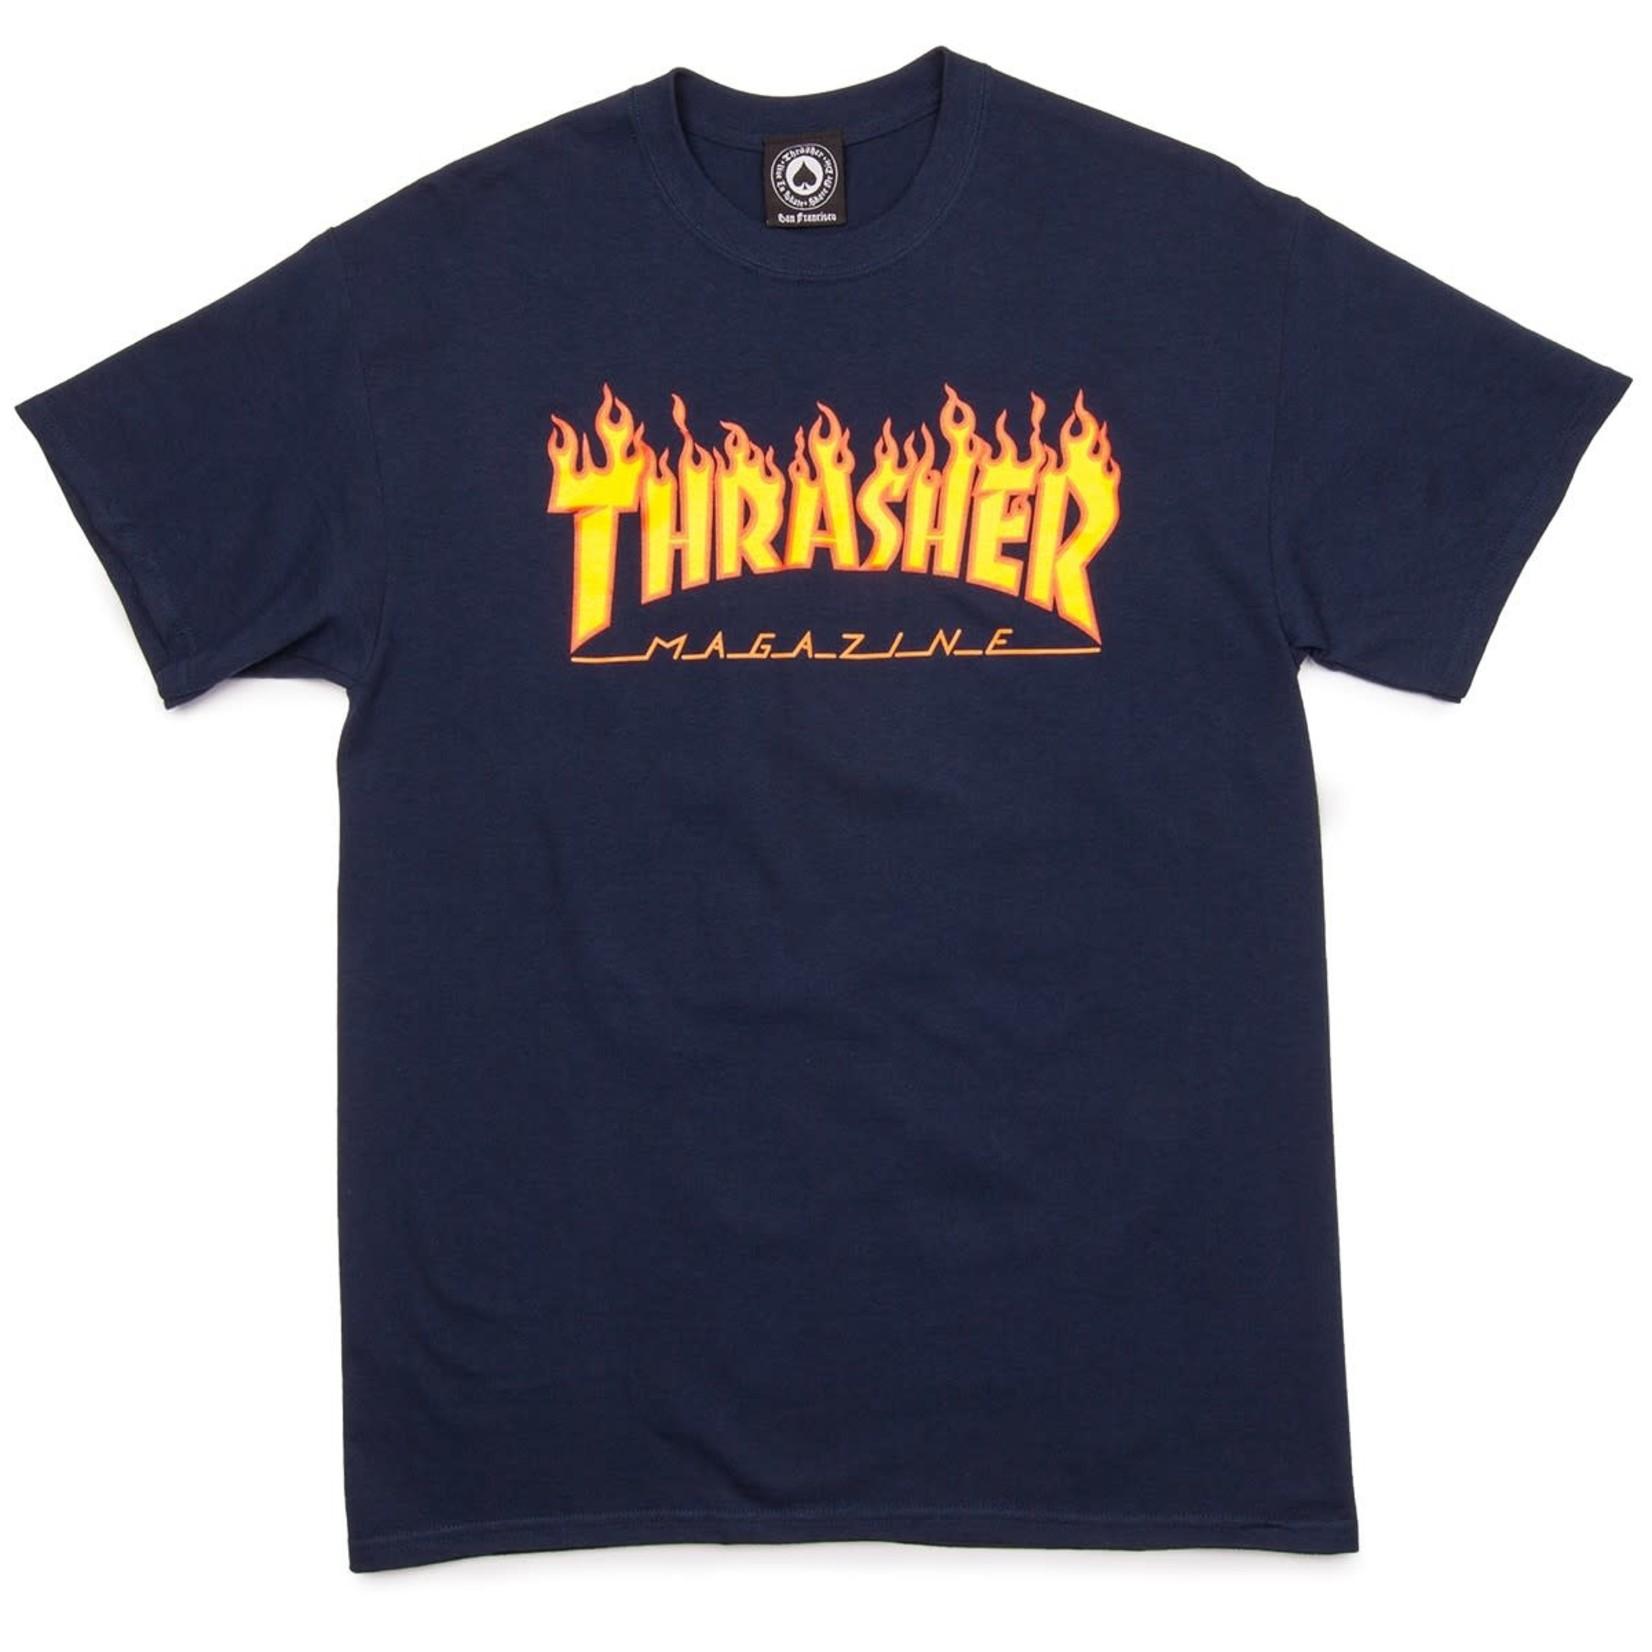 Thrasher Thrasher Flames Logo T-Shirt